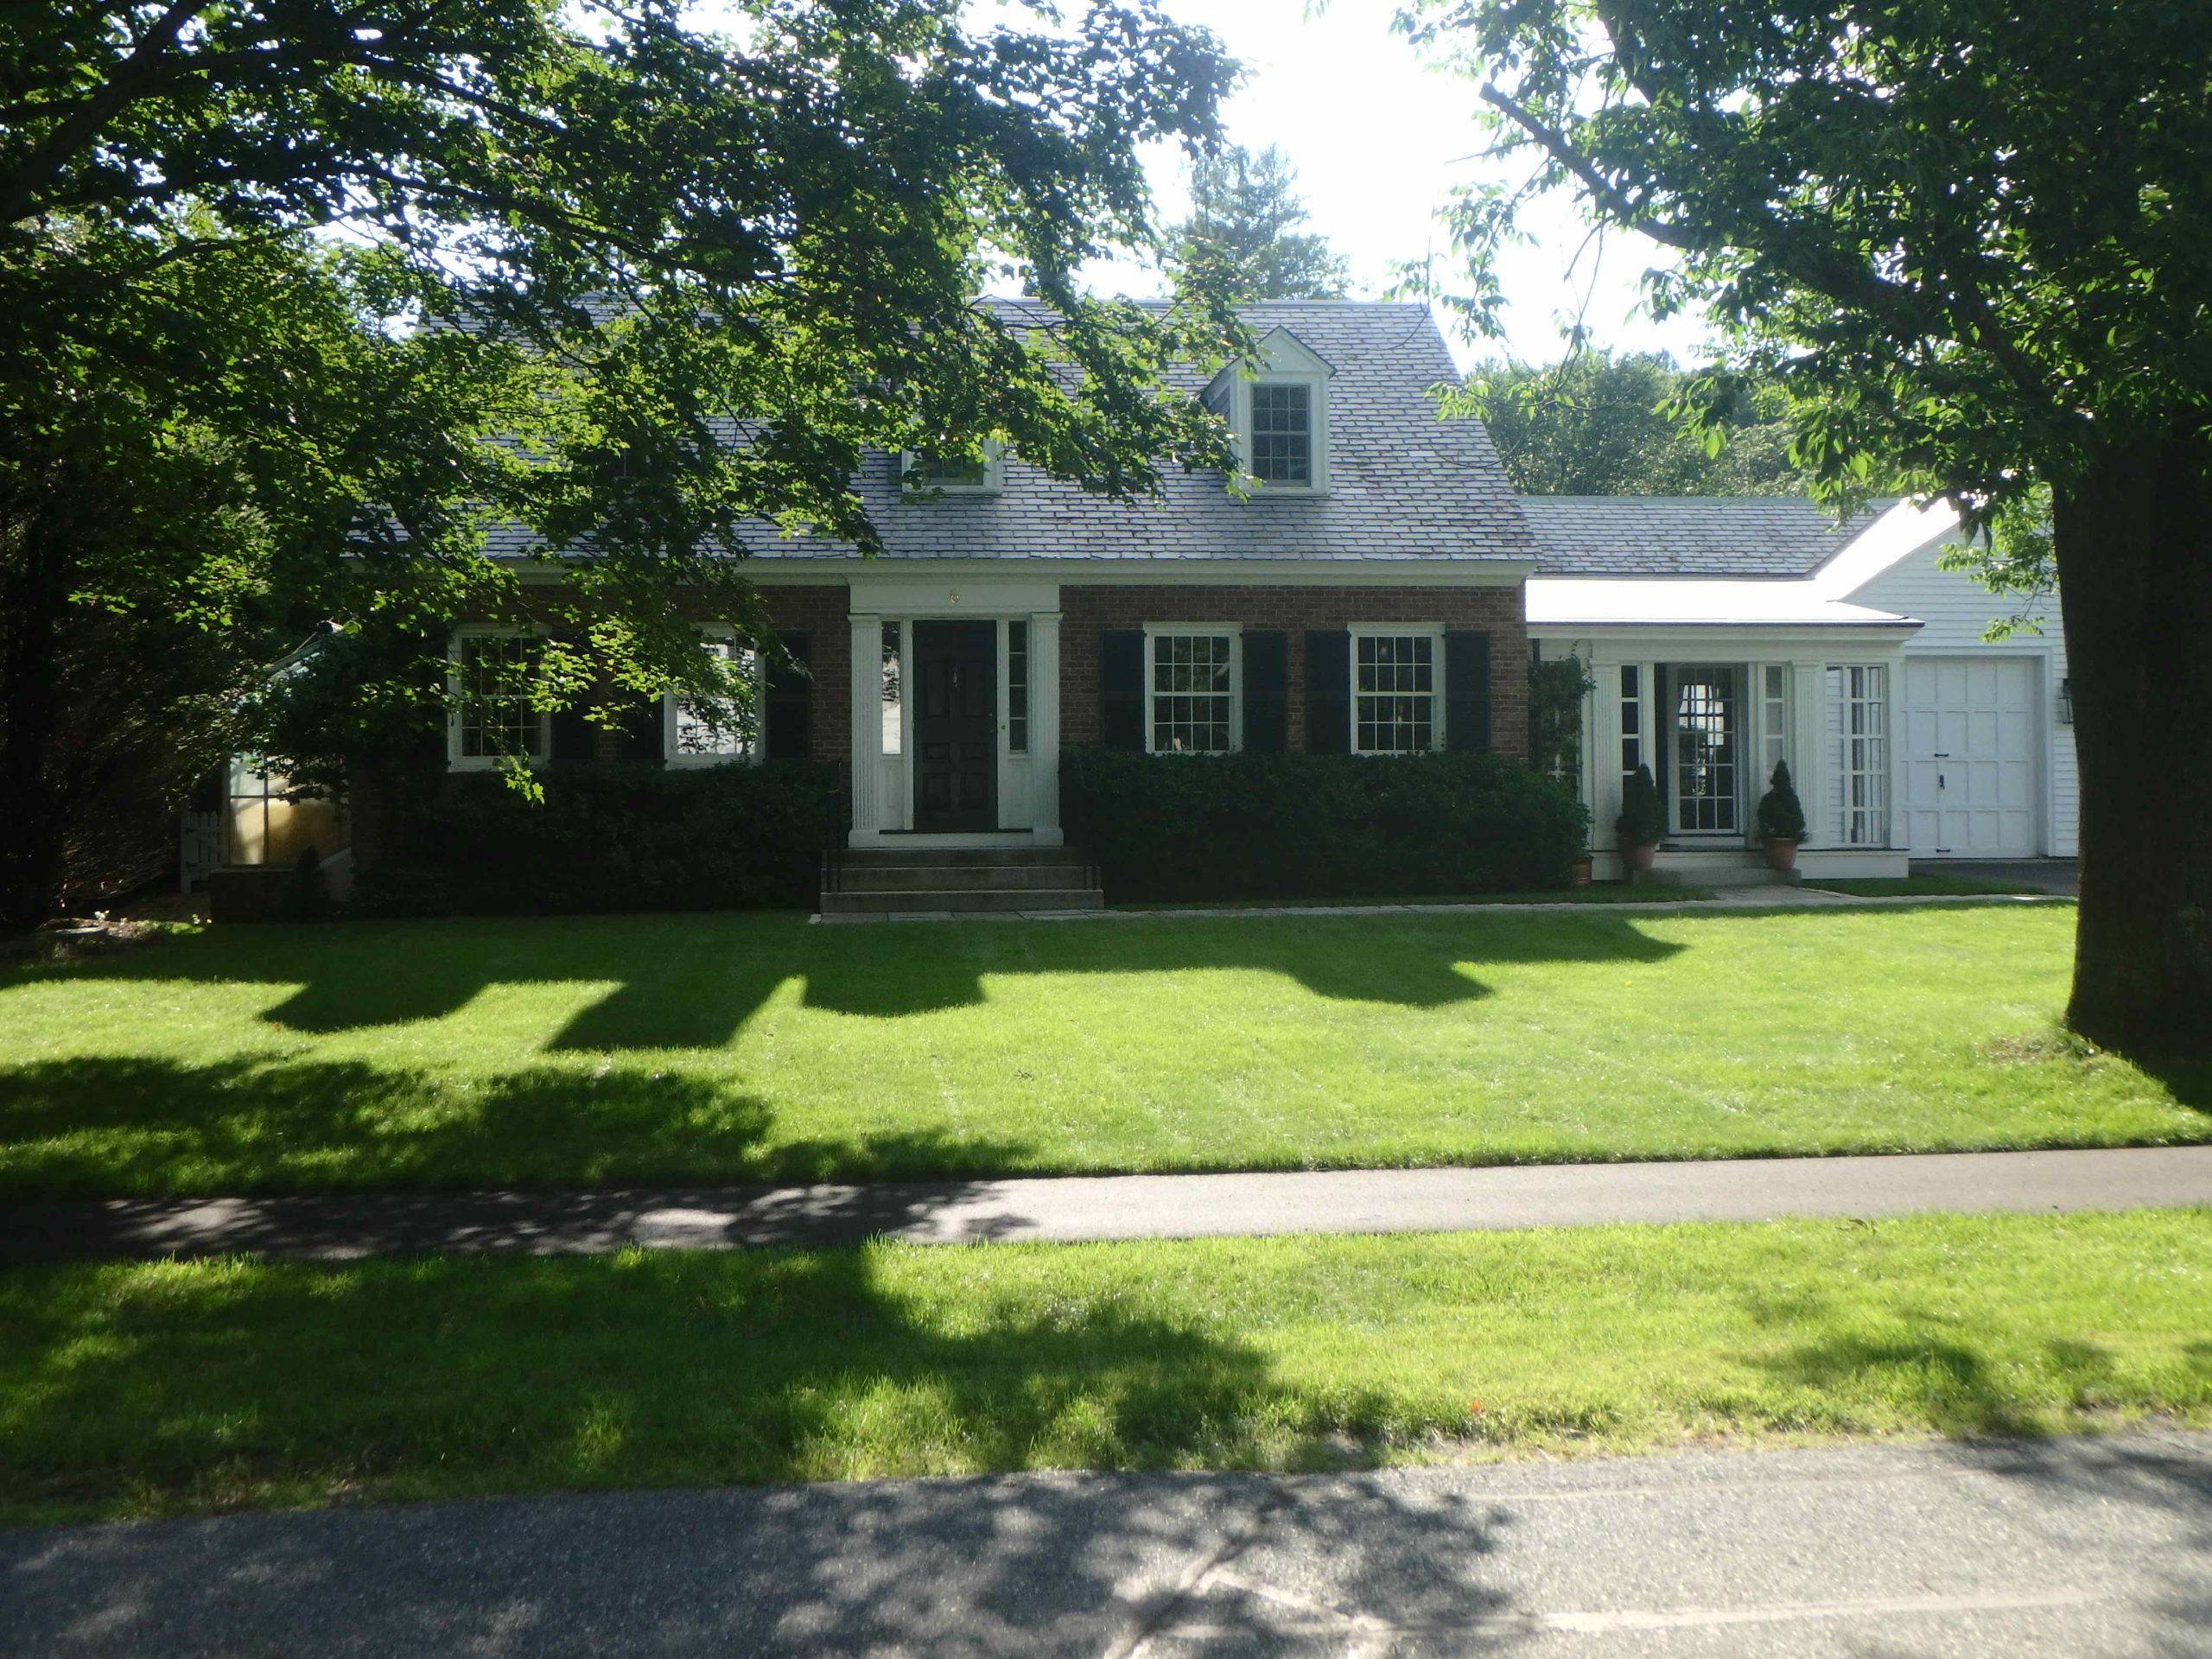 The Beattie residence